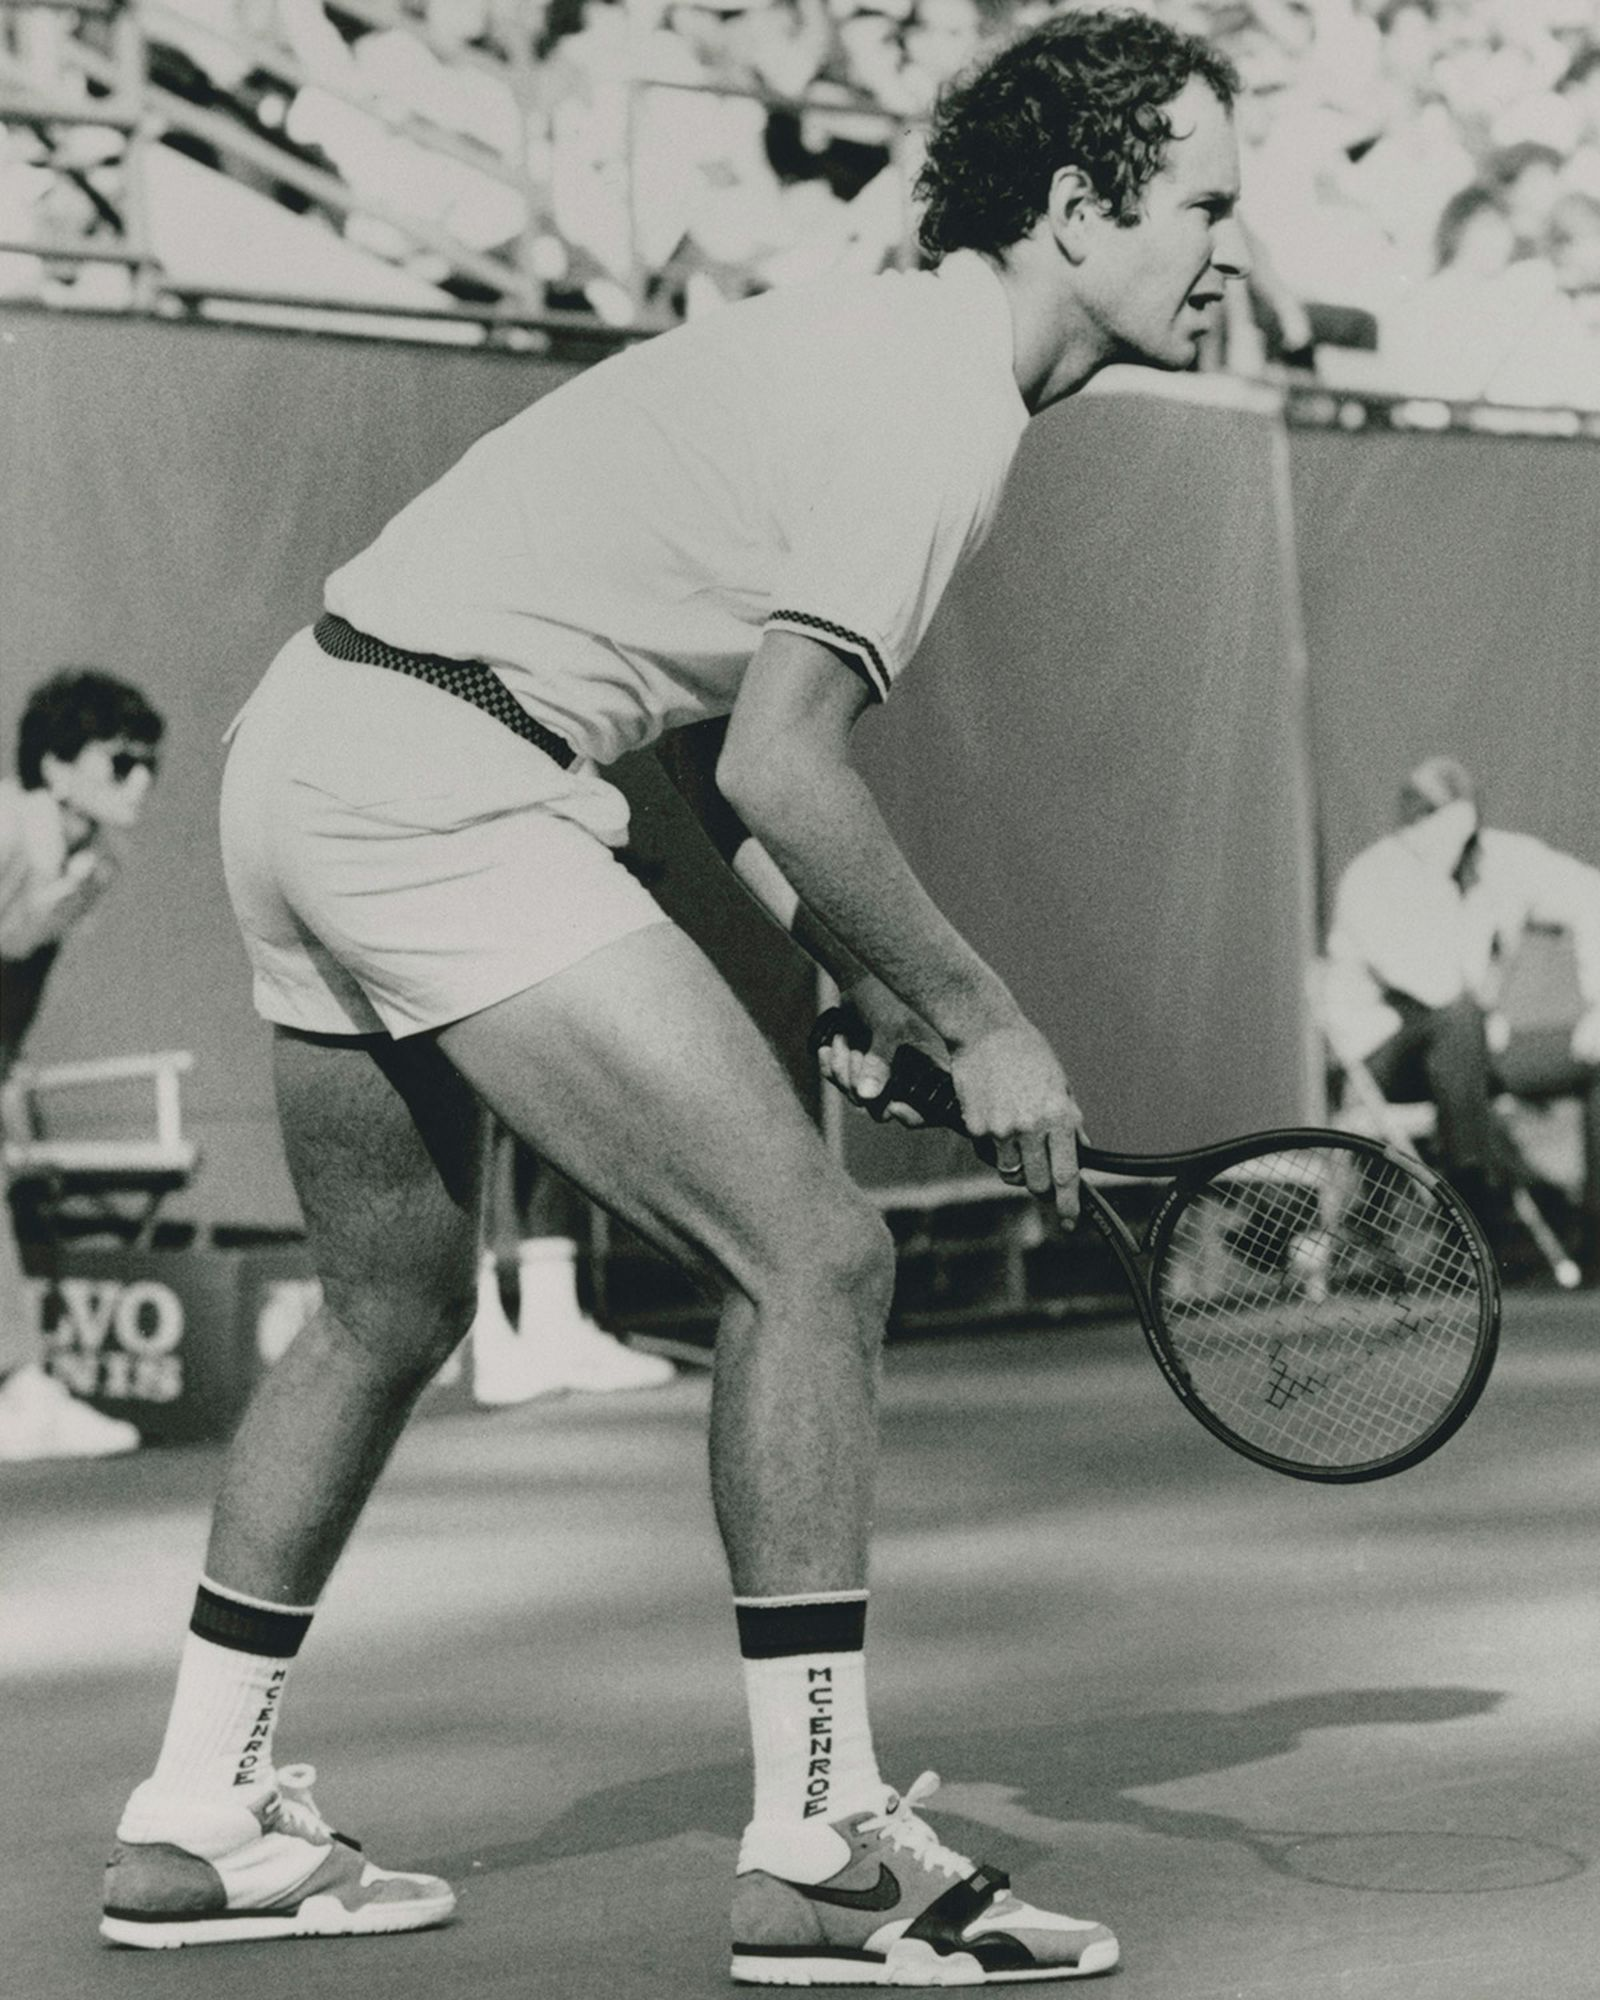 John McEnroe wearing the Nike Air Trainer 1